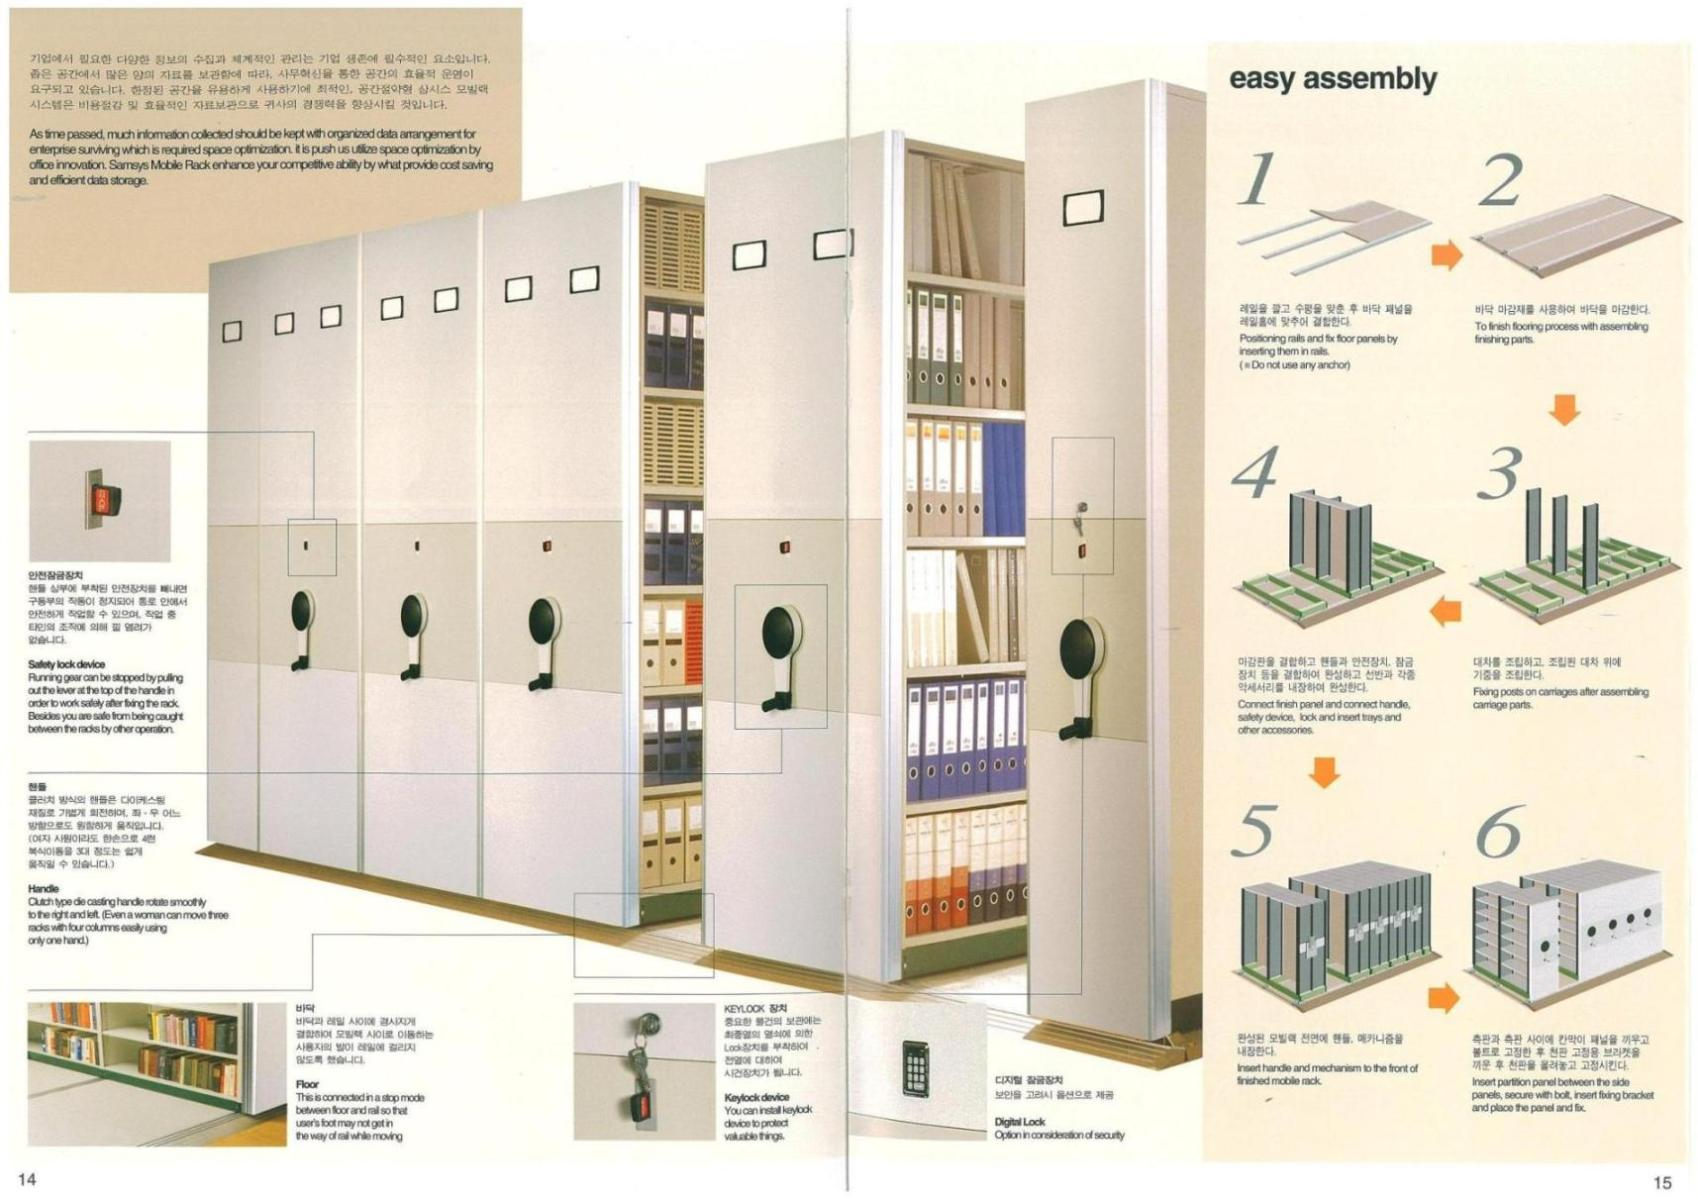 Singapore File Cabinets Sale, Singapore File Cabinets Sale ...